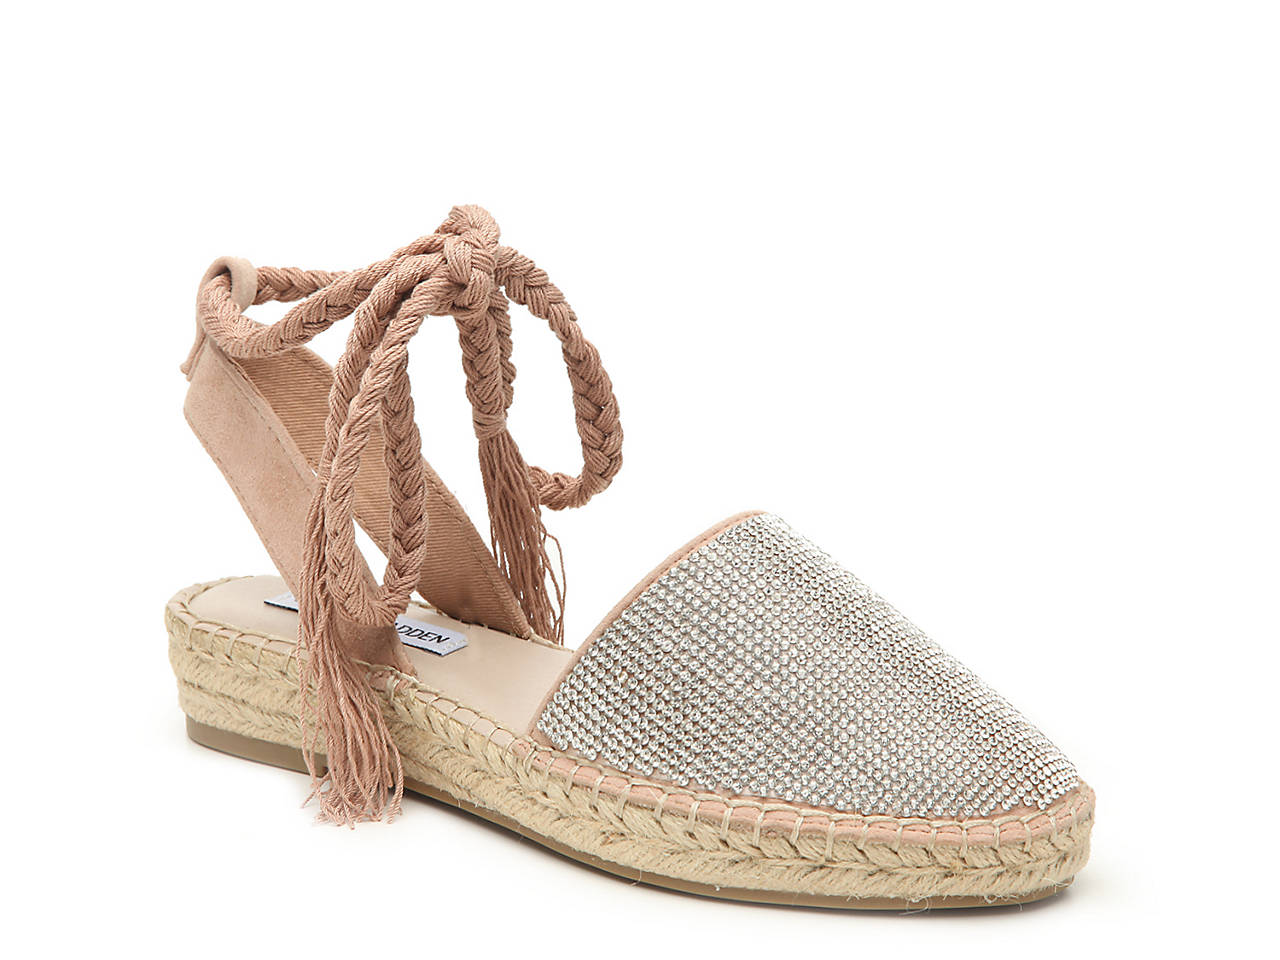 8308aaad9a8 Steve Madden Mesa Espadrille Sandal Women s Shoes